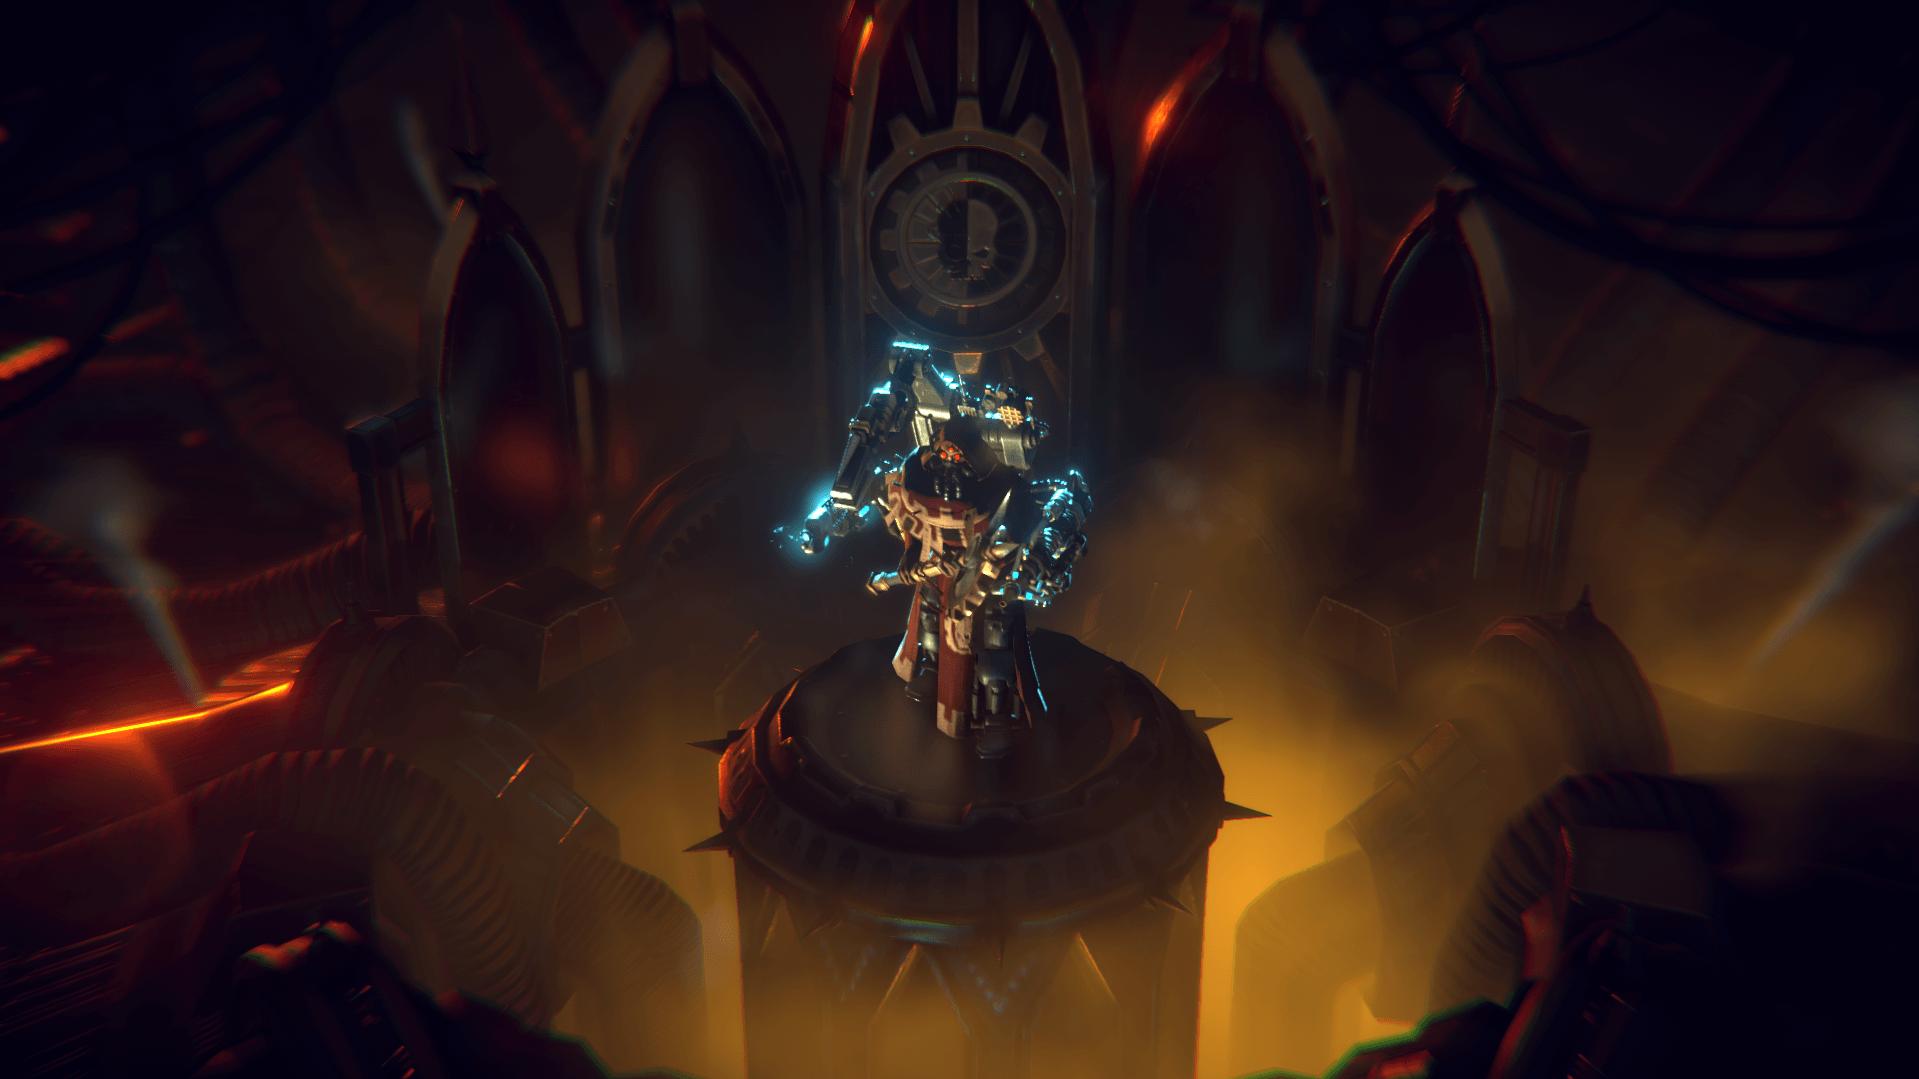 Warhammer 40,000: Mechanicus - Omnissiah Edition